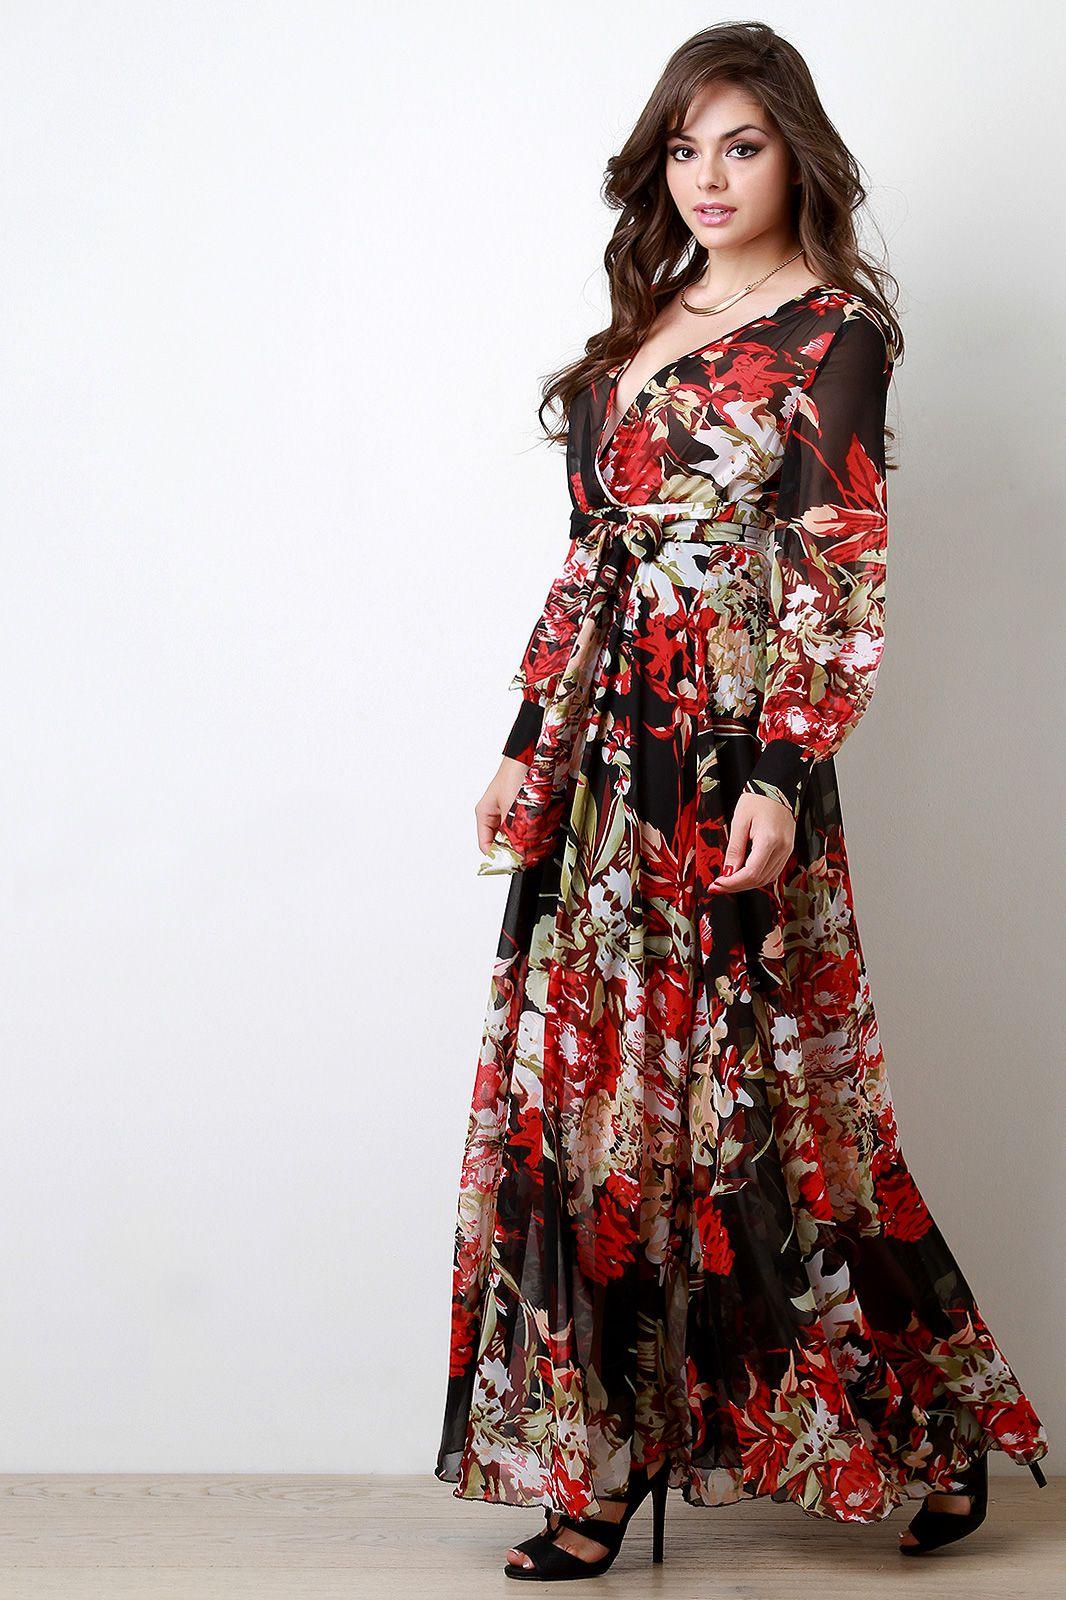 Chiffon Floral Print Surplice Maxi Dress Urbanog Printed Dress Outfit Floral Print Dress Outfit Spring Outfits [ 1600 x 1066 Pixel ]